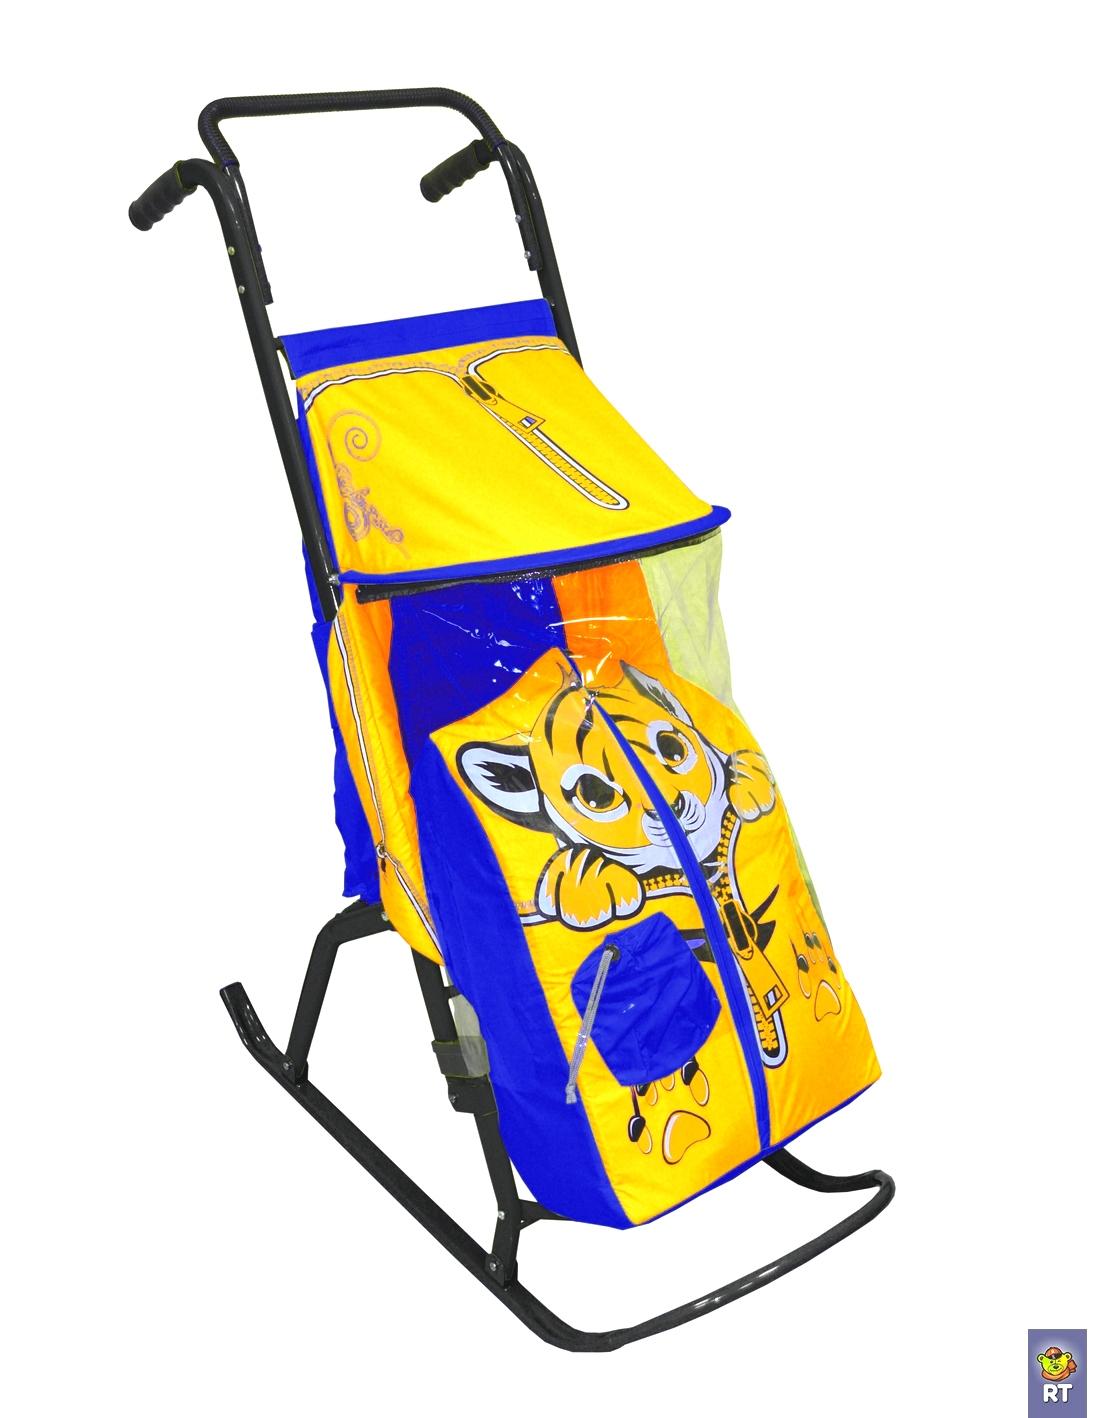 Санки-коляска - Снегурочка-2-Р – Тигренок, цвет желтый-голубойСанки и сани-коляски<br>Санки-коляска - Снегурочка-2-Р – Тигренок, цвет желтый-голубой<br>